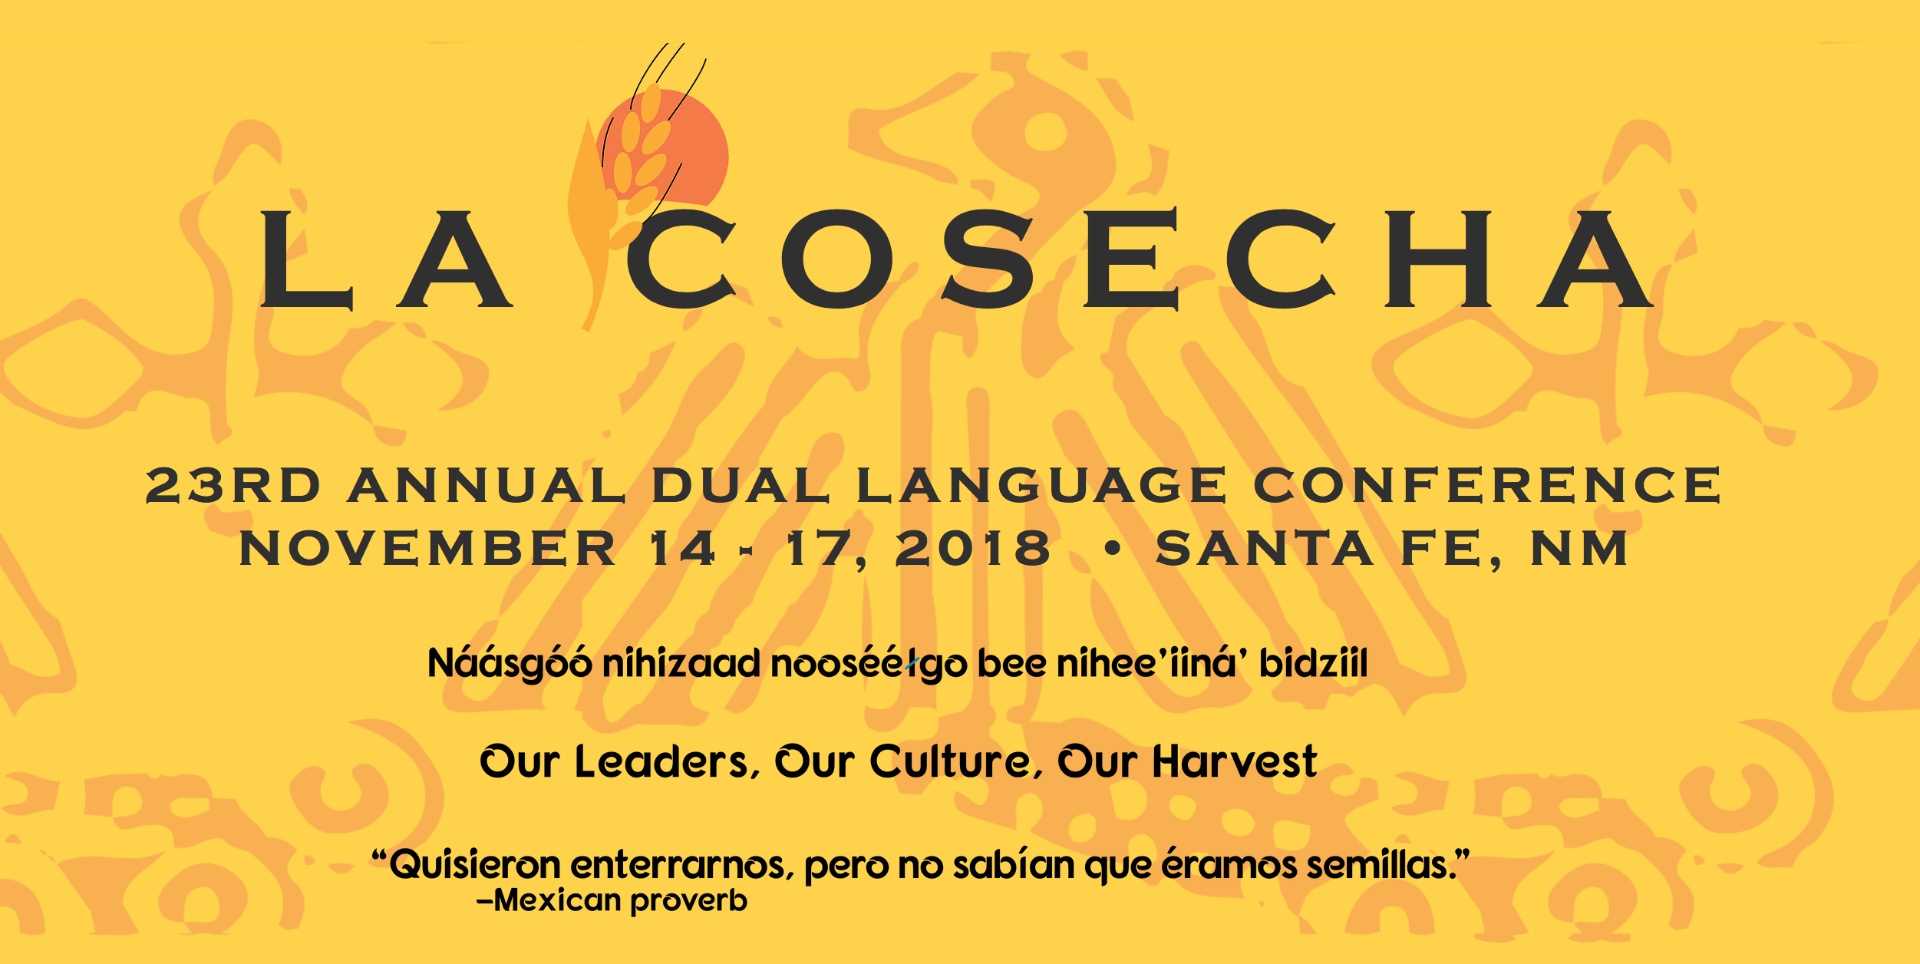 La Cosecha 2018: Updates from the Field